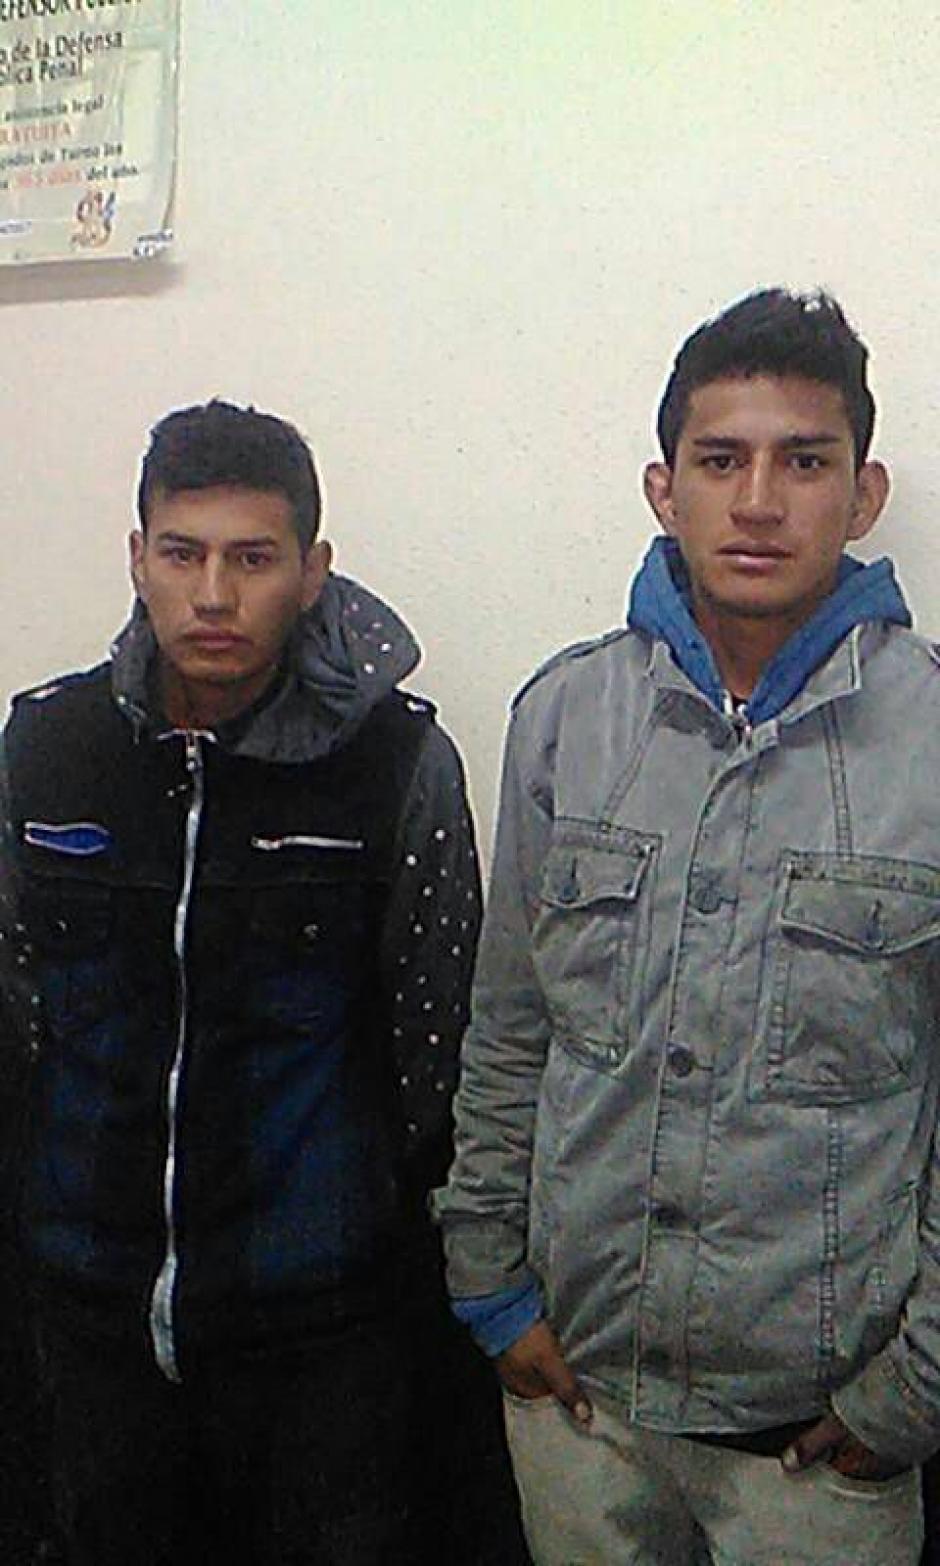 Los detenidos son Élder Rogelio y Jorge Armando Villatoro Tepe. (Foto: @Erick Colop100)